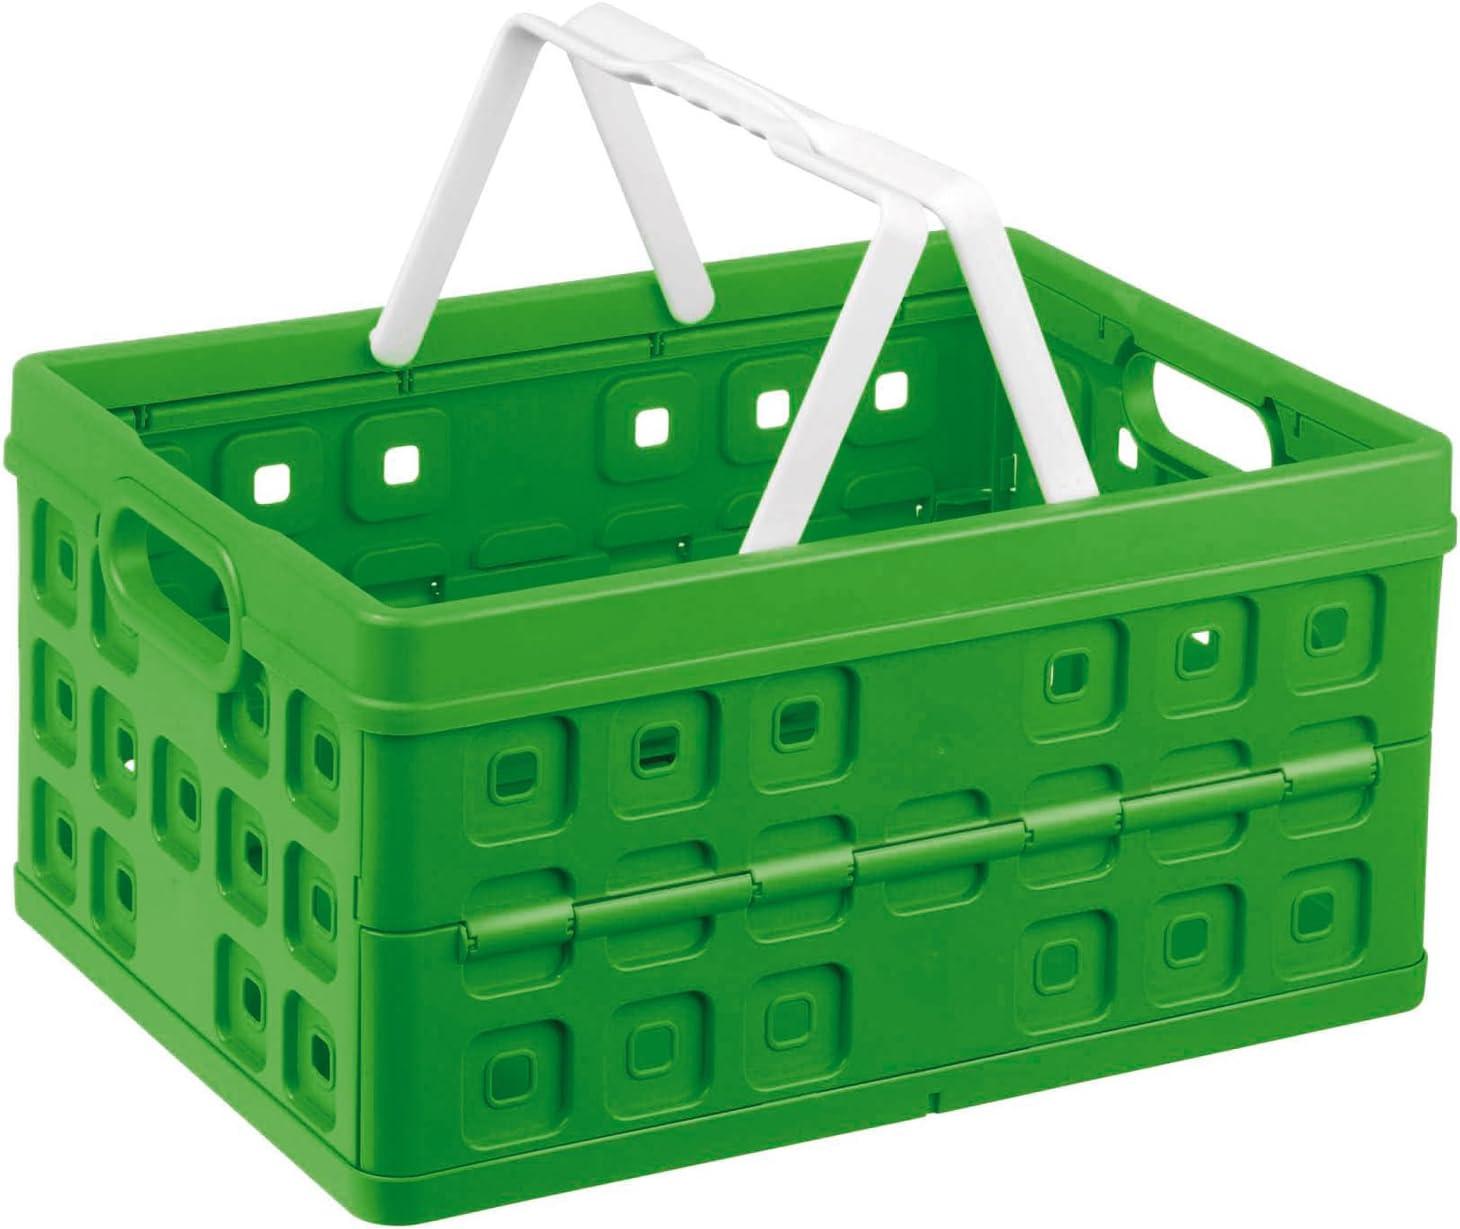 Sunware 57100661 - Caja de almacenaje (Plegable, con asa, 32 L): Amazon.es: Hogar